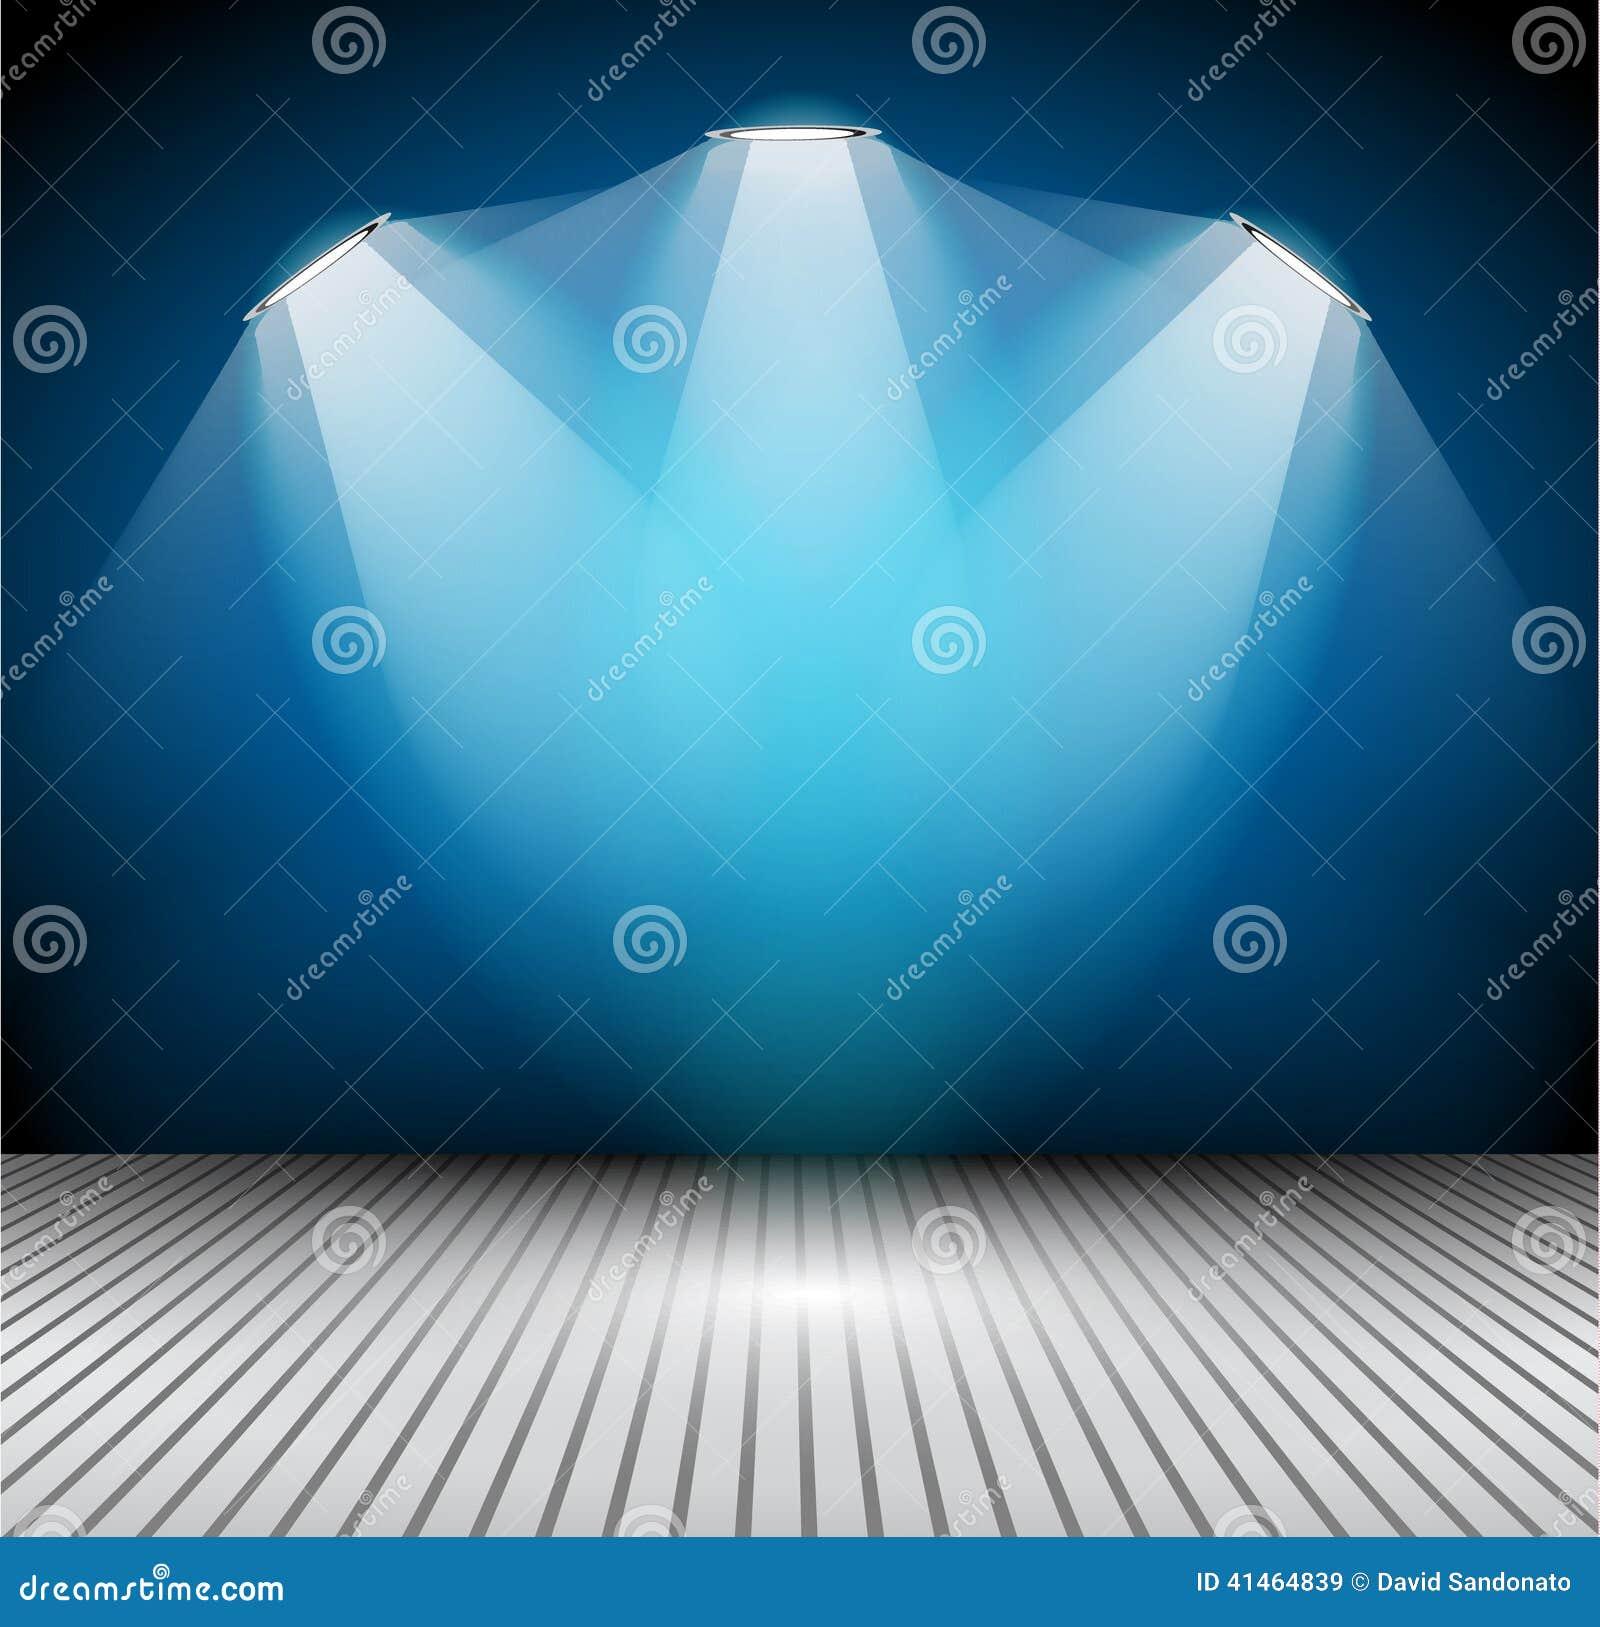 Modern interior art gallery frame design with spotlights for Spotlight design